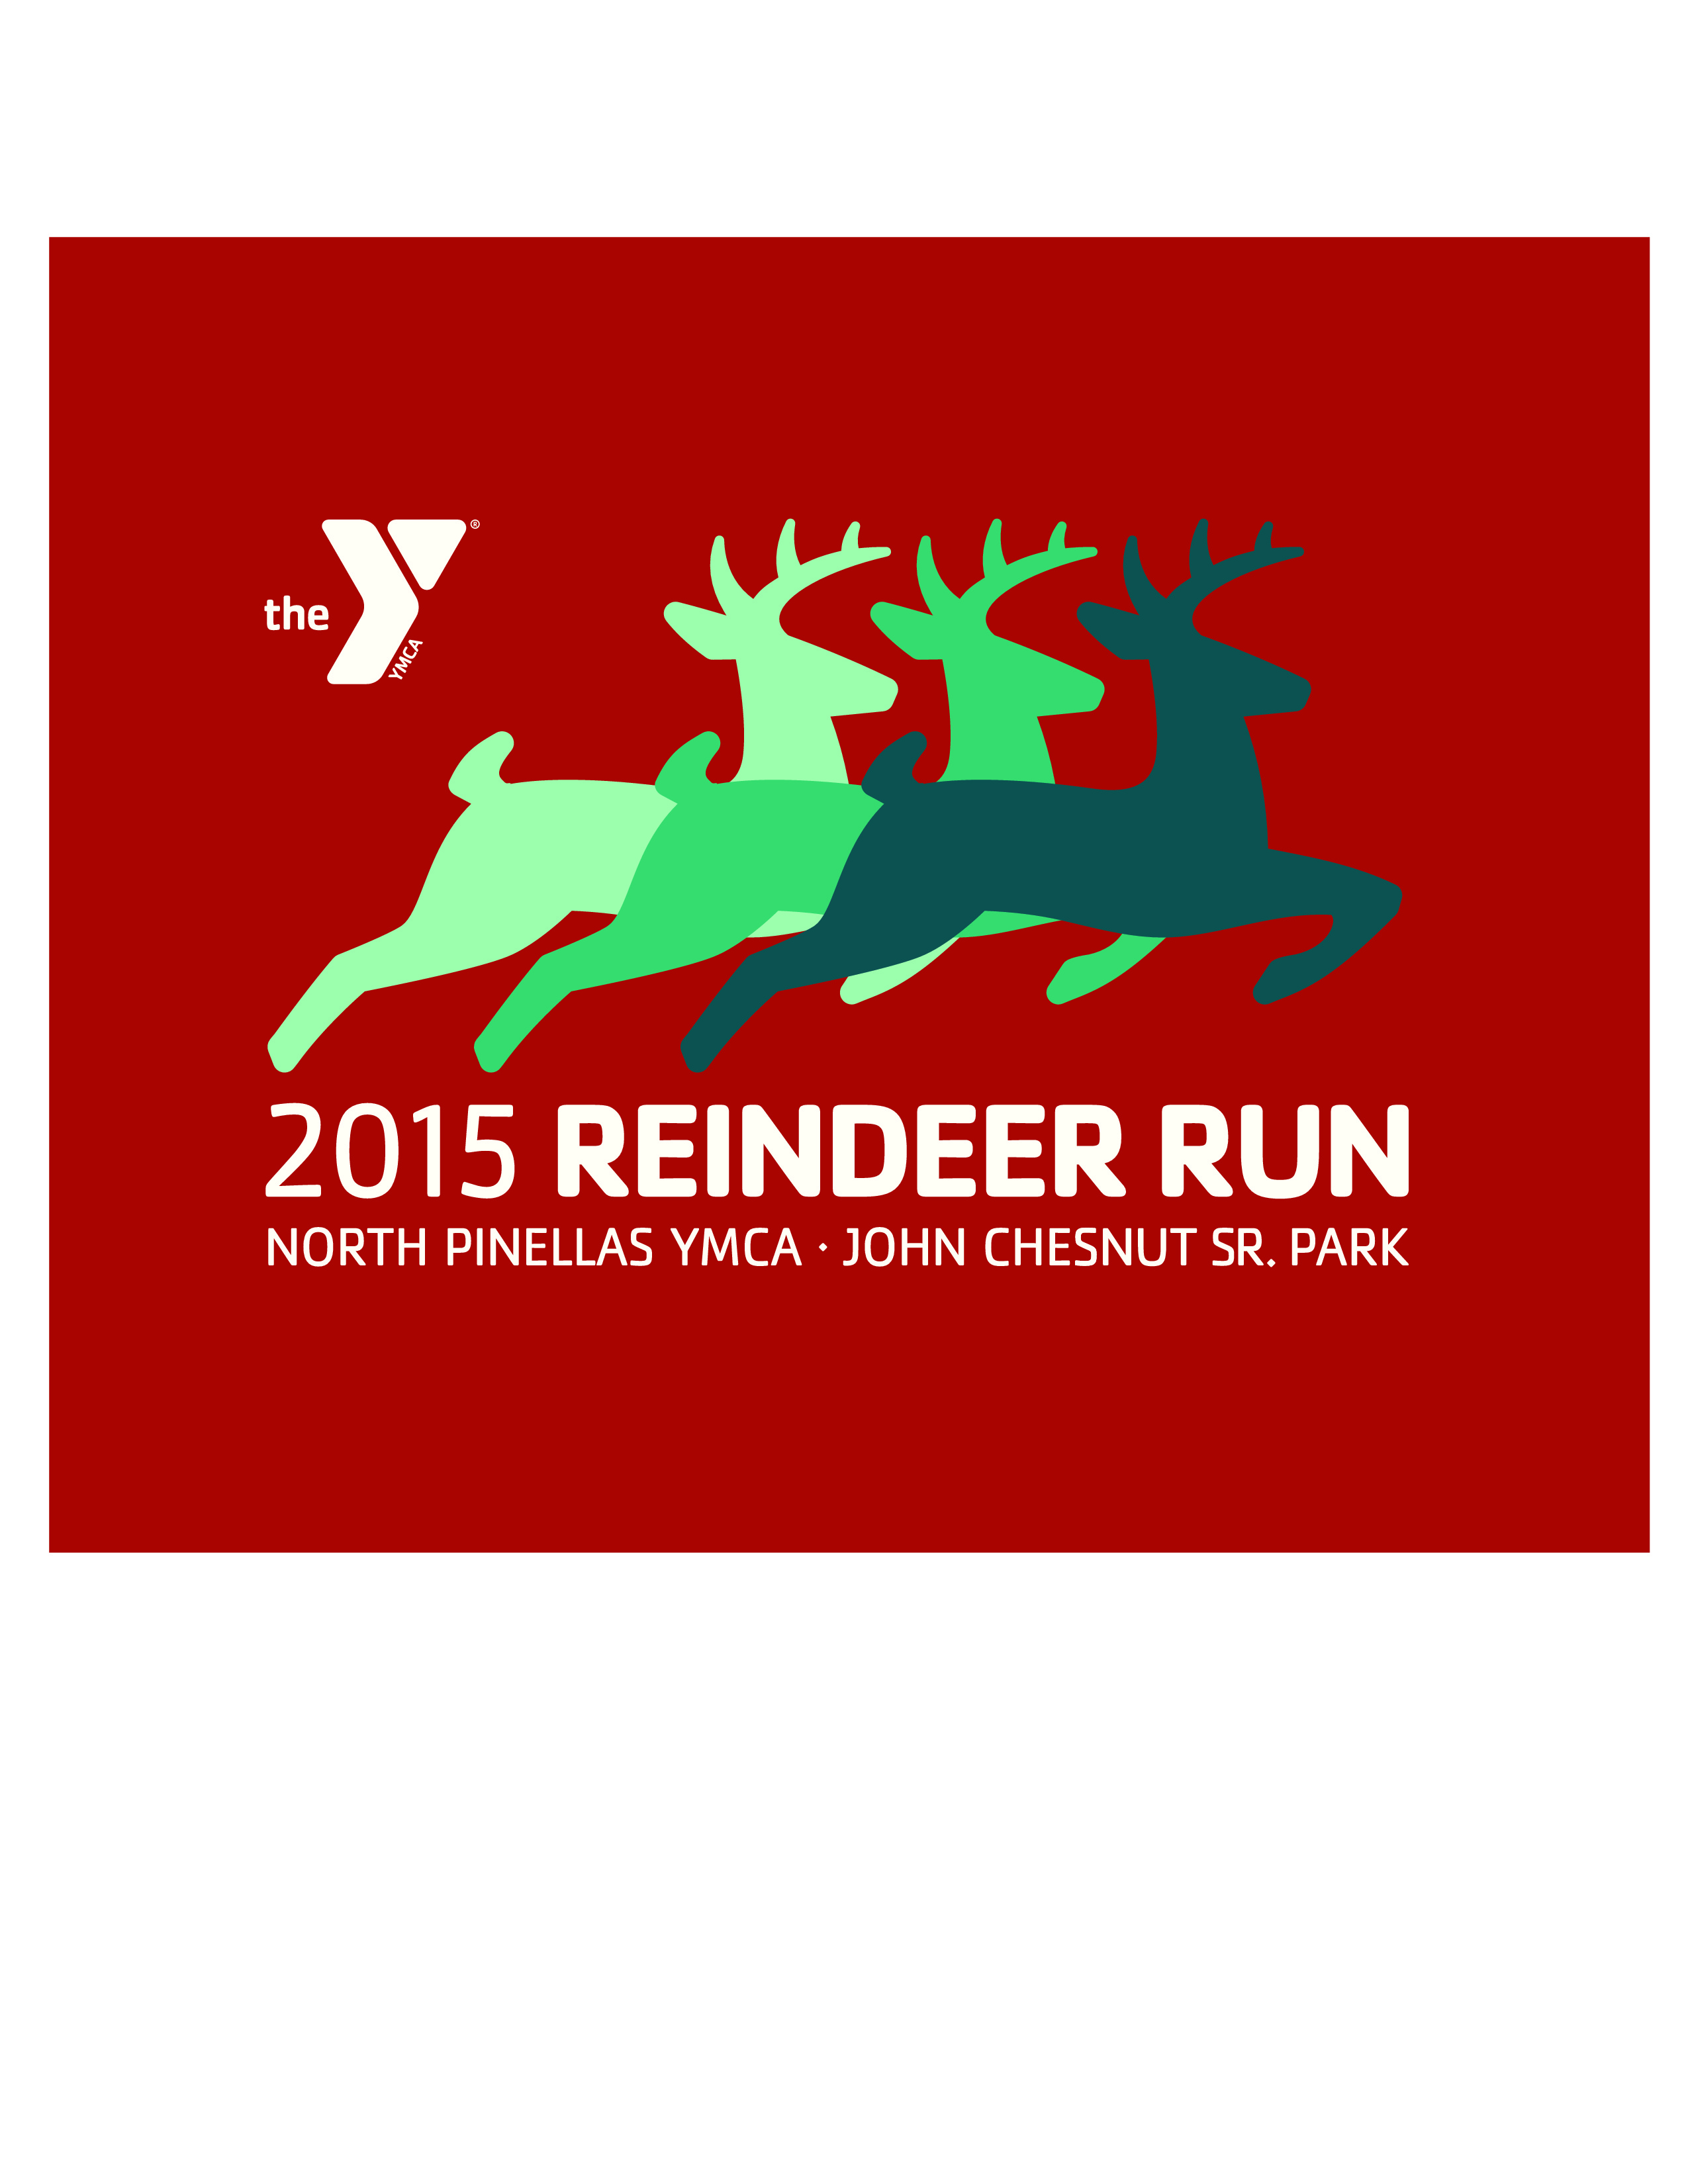 ymca reindeer run 5k u0026 1 mile walk run palm harbor fl 2015 active